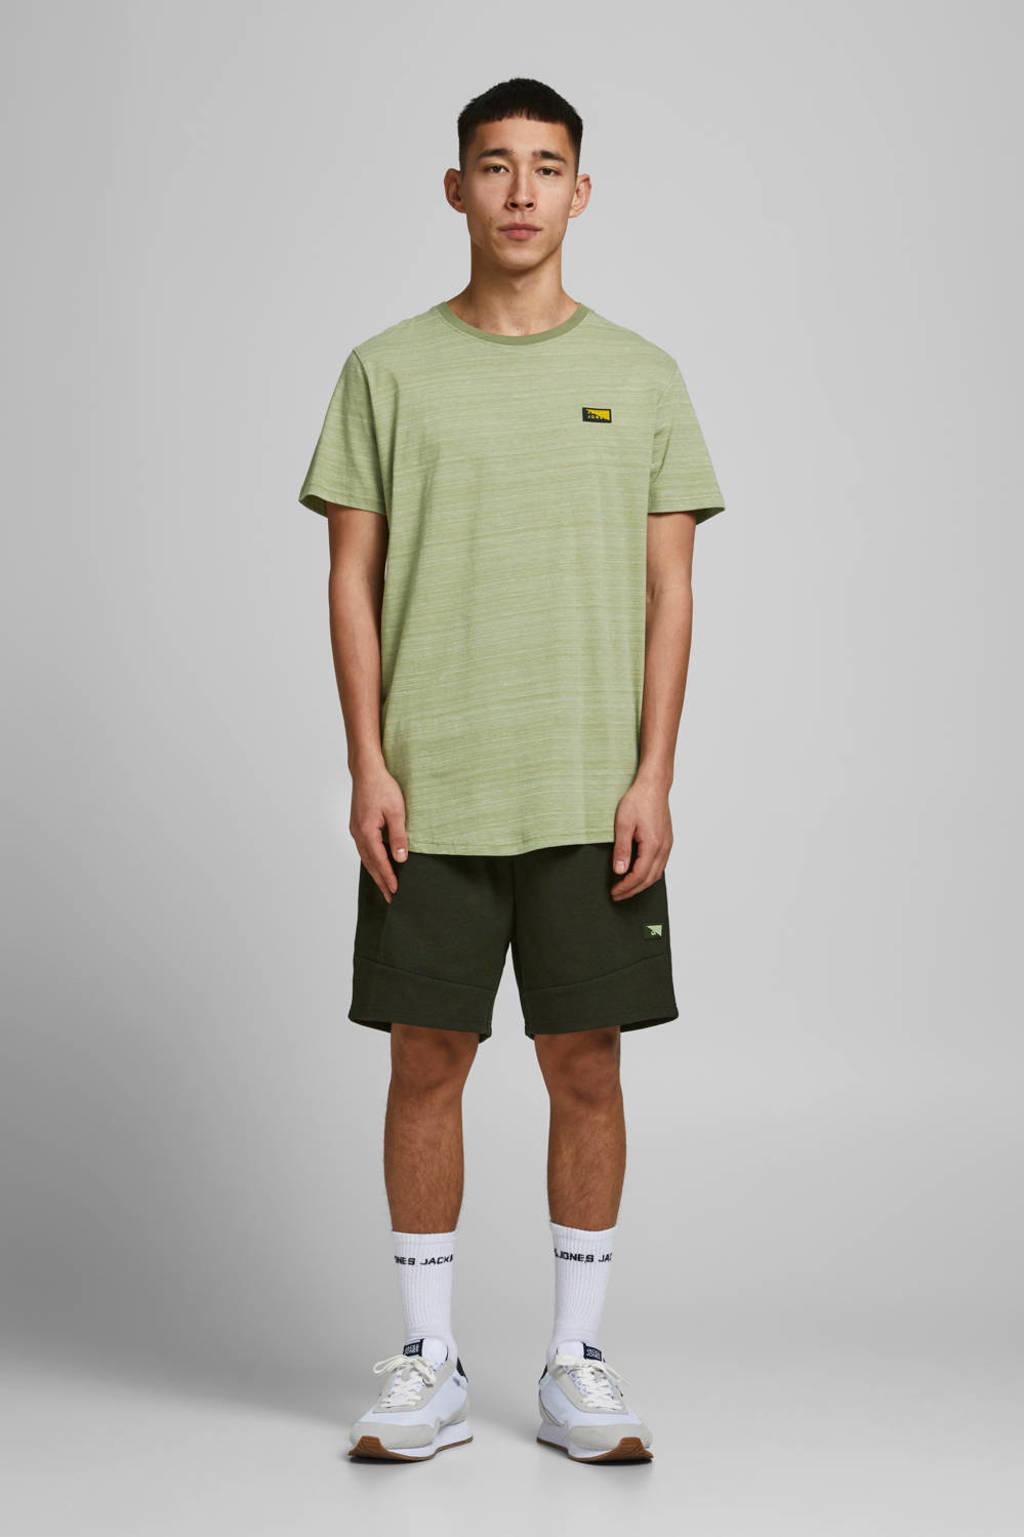 JACK & JONES CORE gemêleerd T-shirt lichtgroen, Lichtgroen